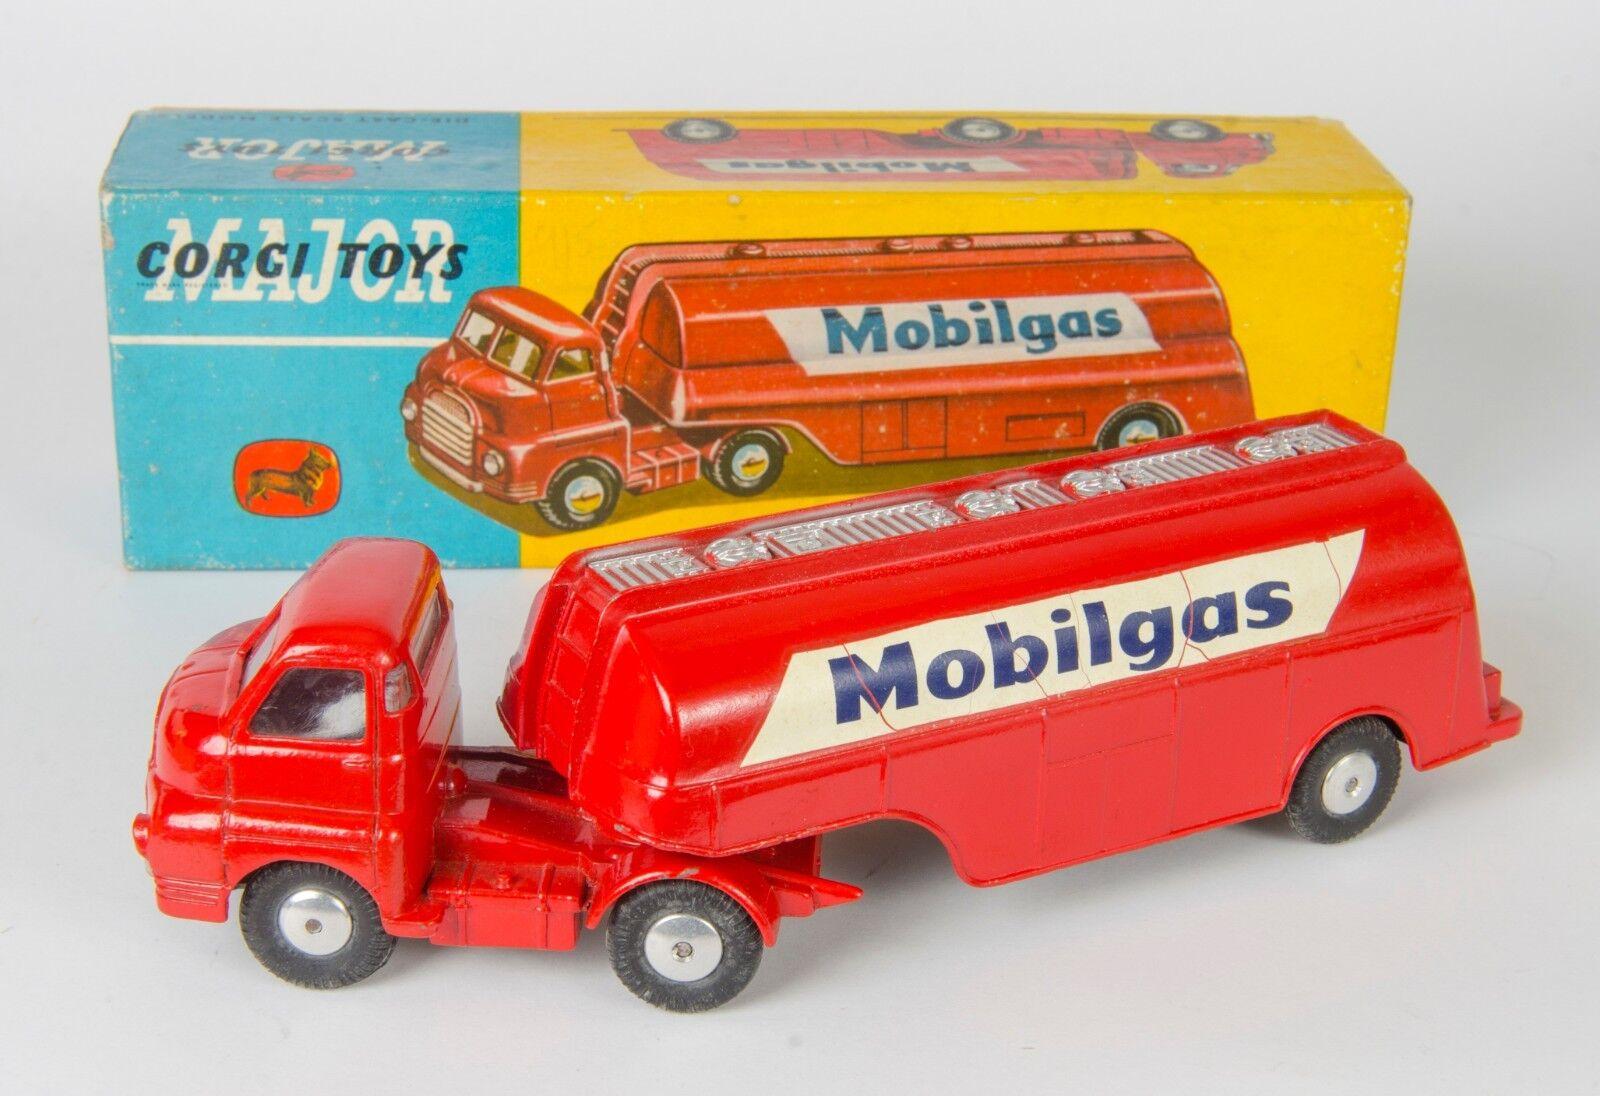 Corgi major 1110 Mobilgas Petrol Tanker.Nära Mint och Boxed.Urspspringaagliga 1950-tal